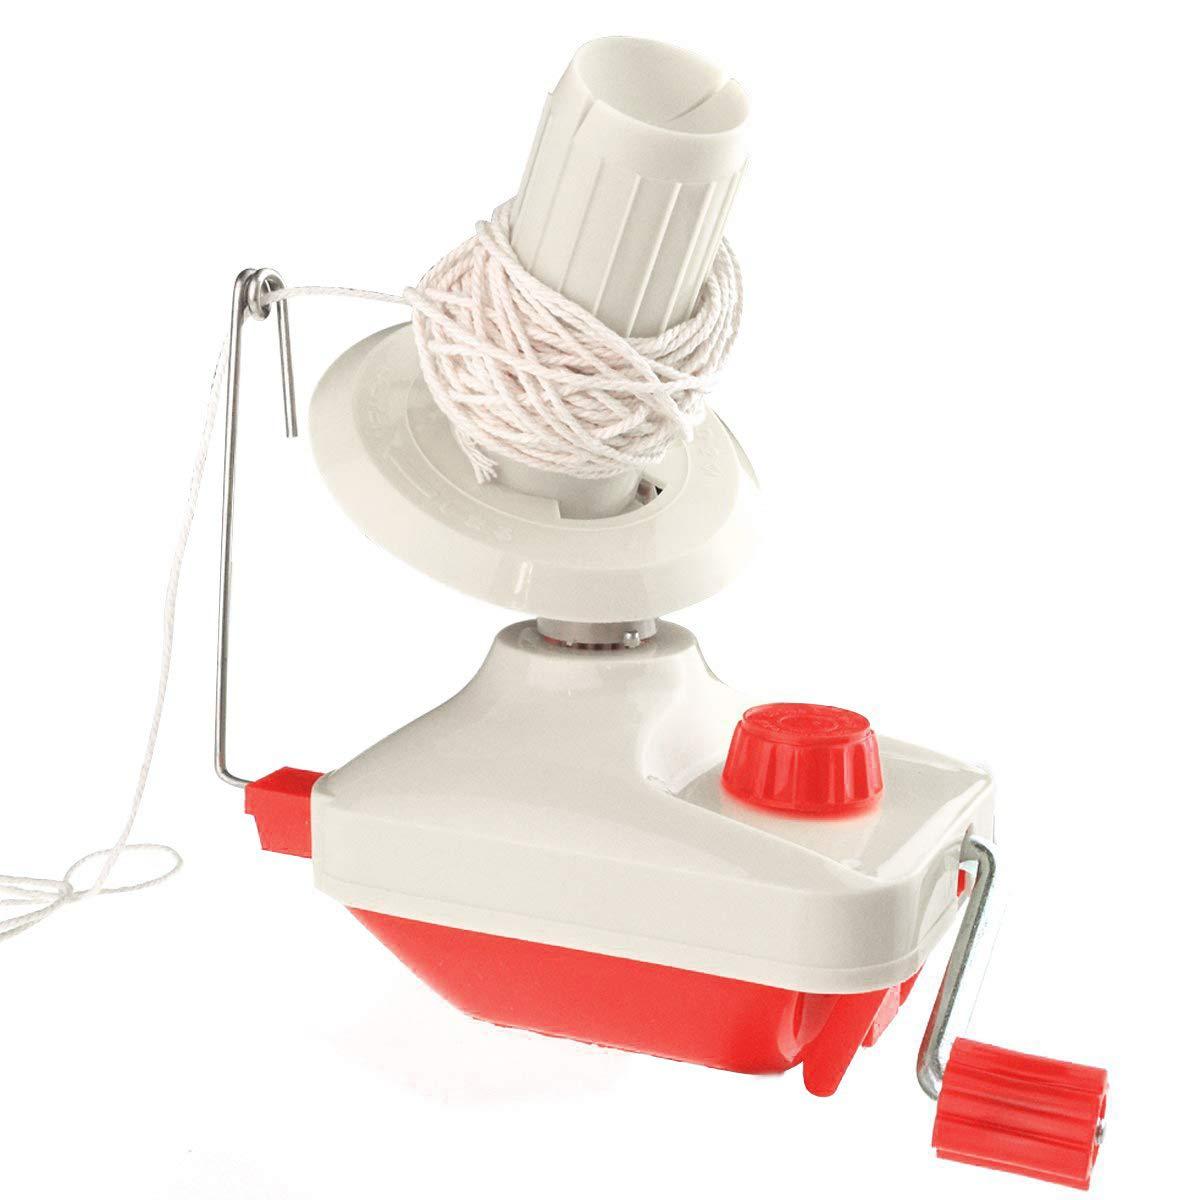 Yarn Ball Winder, Bobbin Winder Hand Operated Manual Wool Winder Holder Organize Knitting Tools for Yarn/Fiber/Wool/String Ball Winder